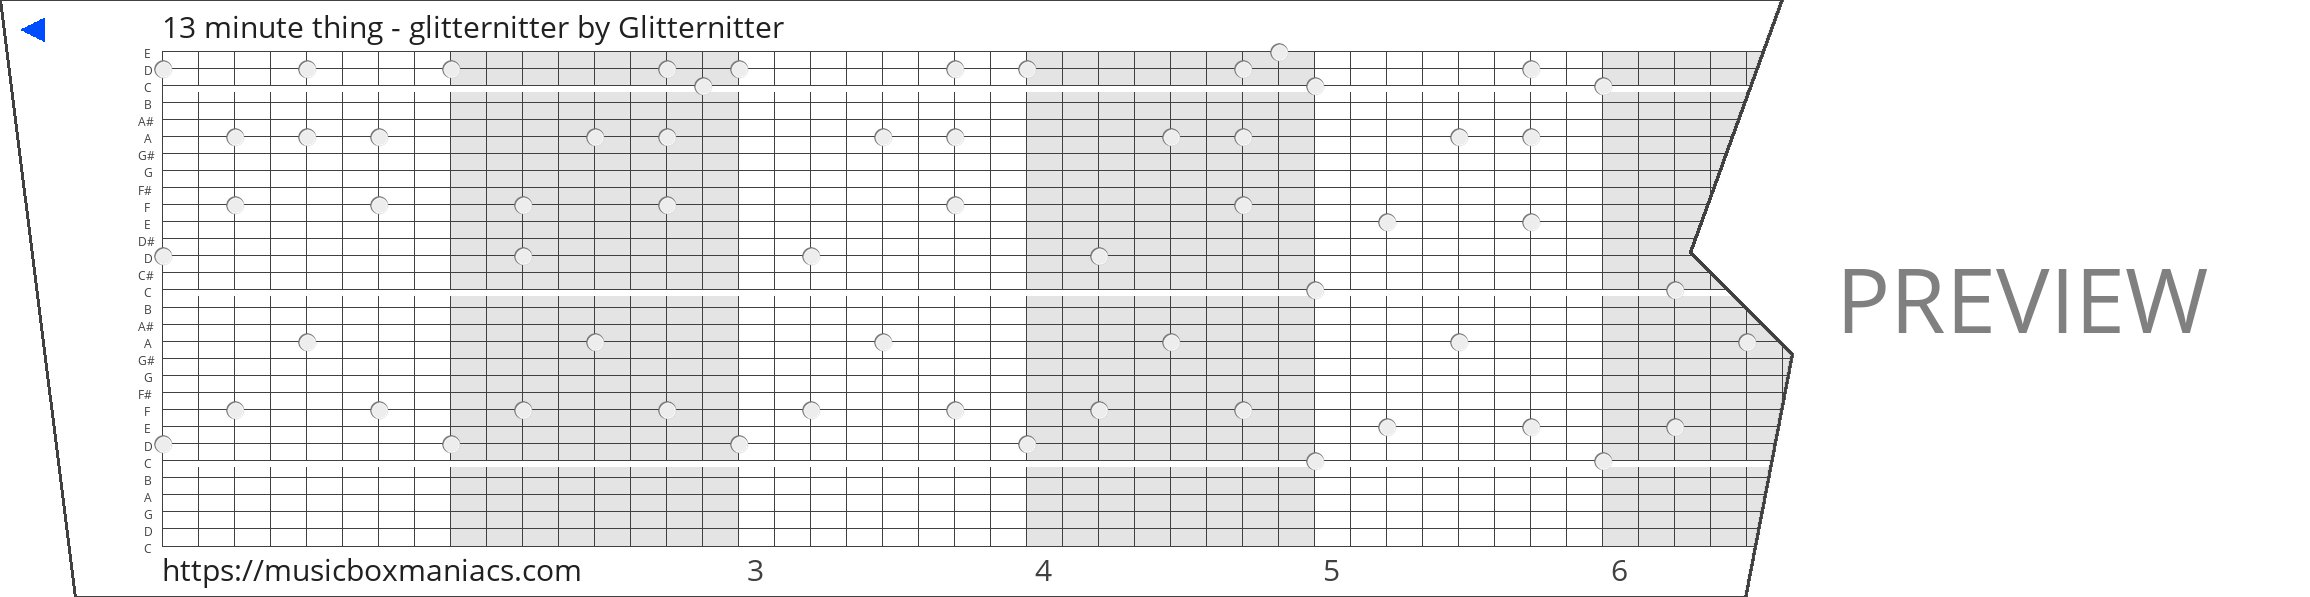 13 minute thing - glitternitter 30 note music box paper strip